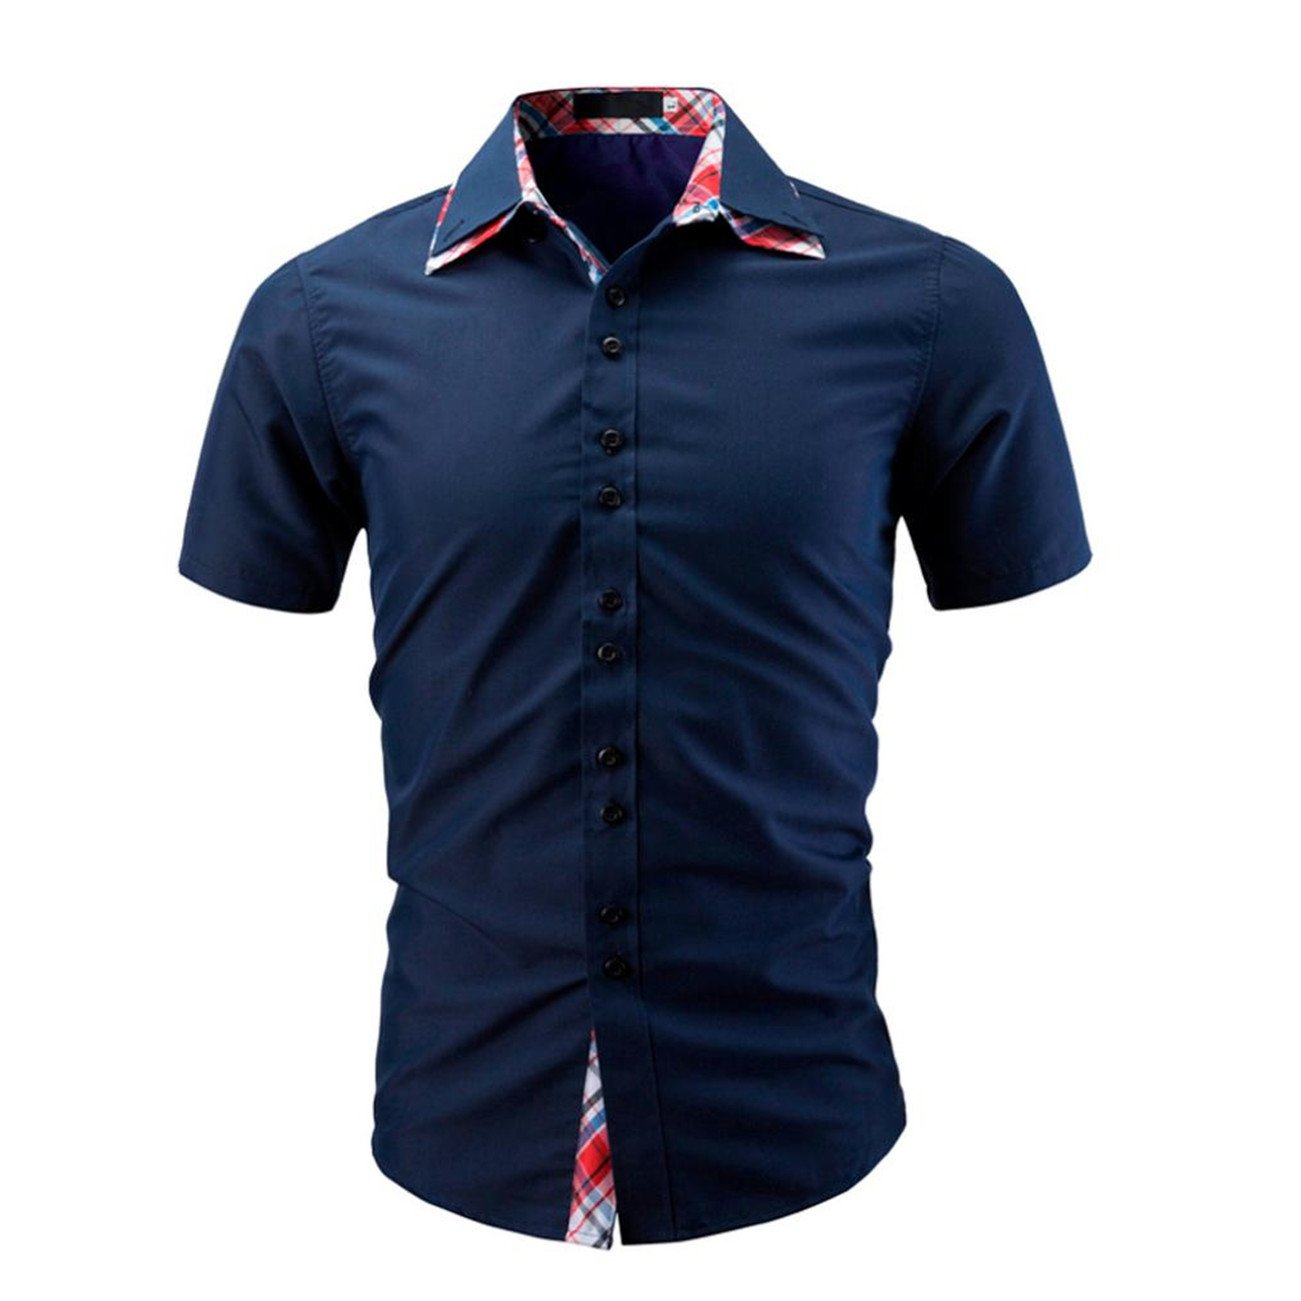 Chemises Homme Chemises BoutonnéEs Chemises Bureau Chemise Homme Chemise à Manches Courtes Chemise HCFKJ - MS